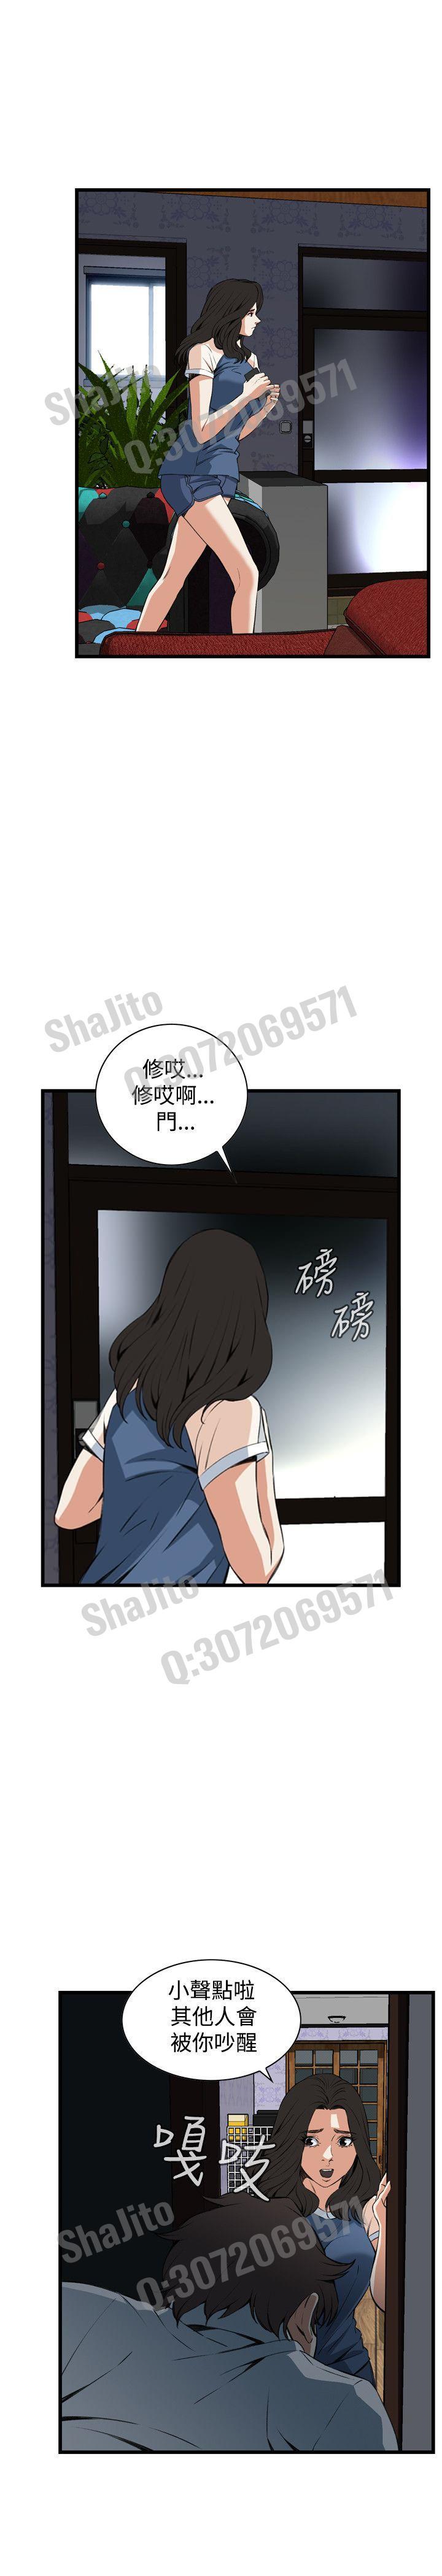 Take a peek 偷窥67-69 Chinese 50